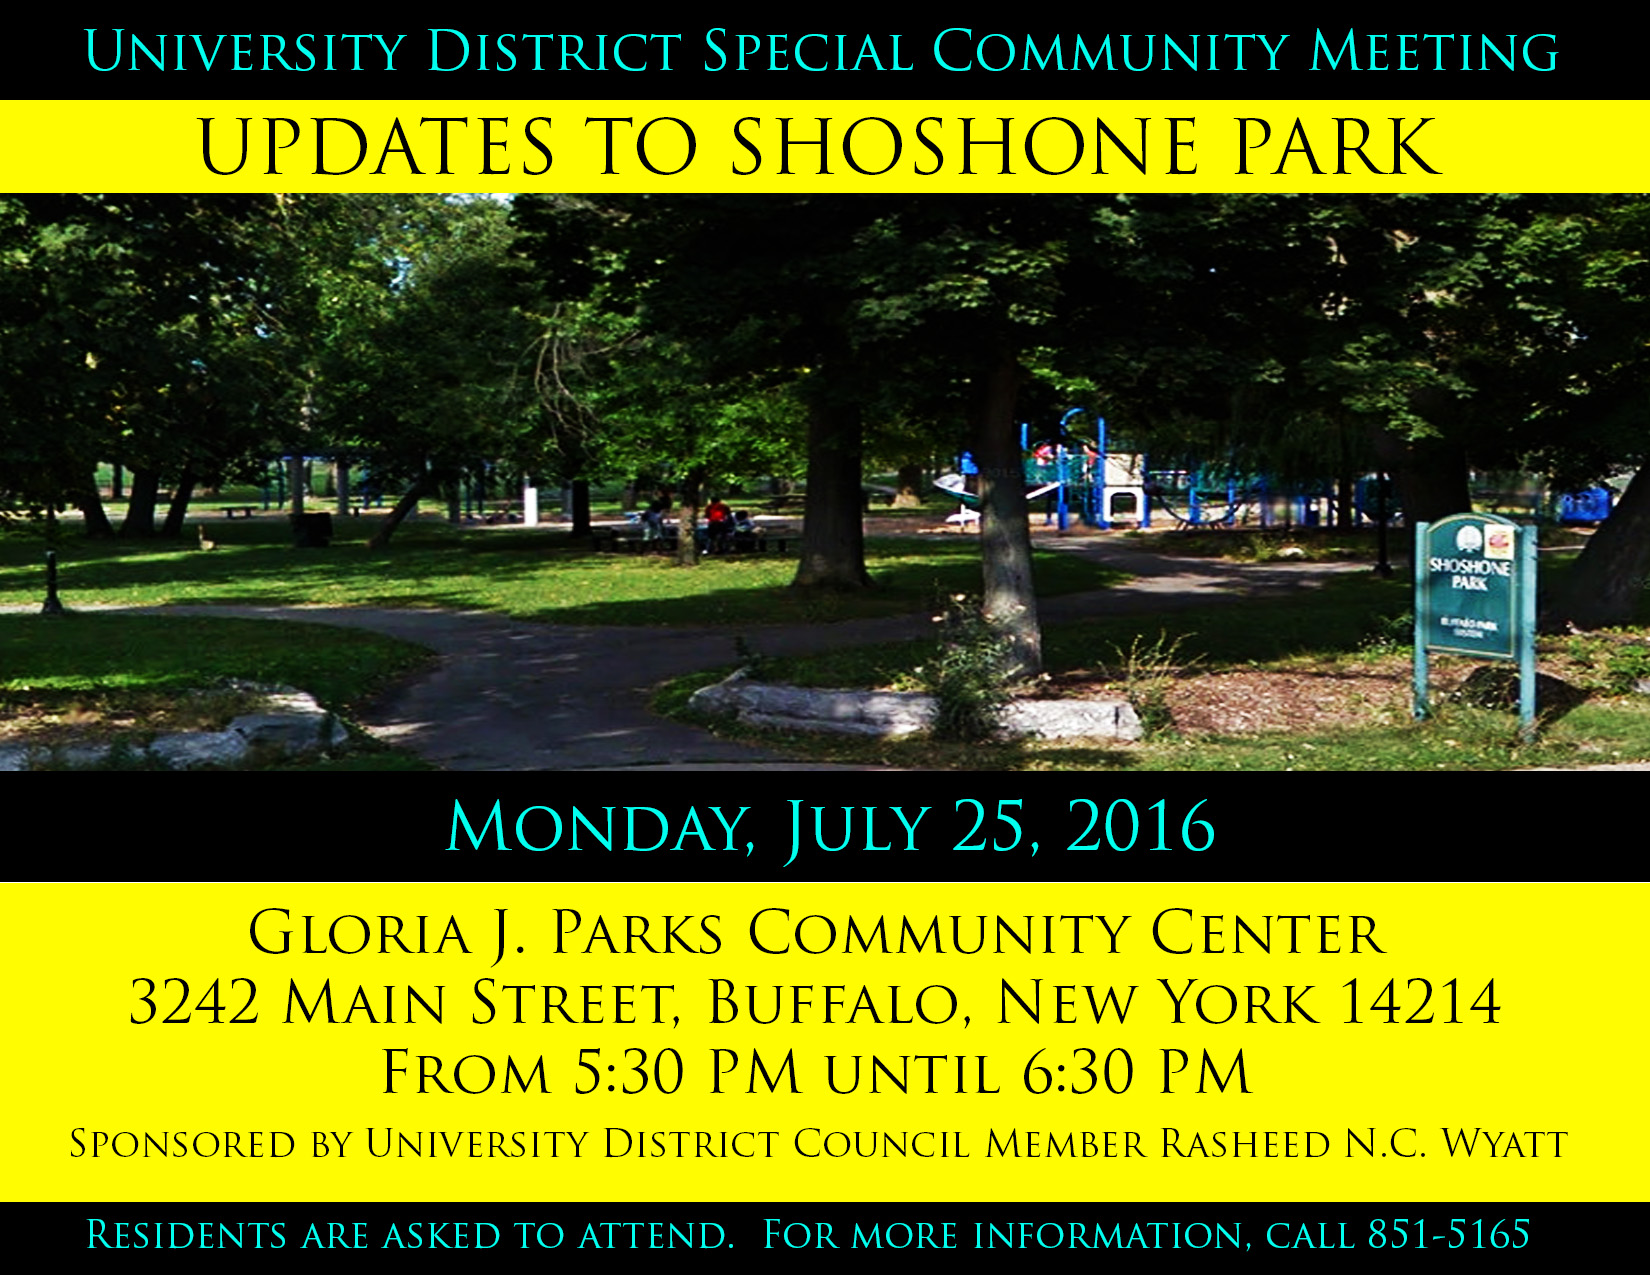 shoshone postcard colo (5)- Updates to Shoshone Park